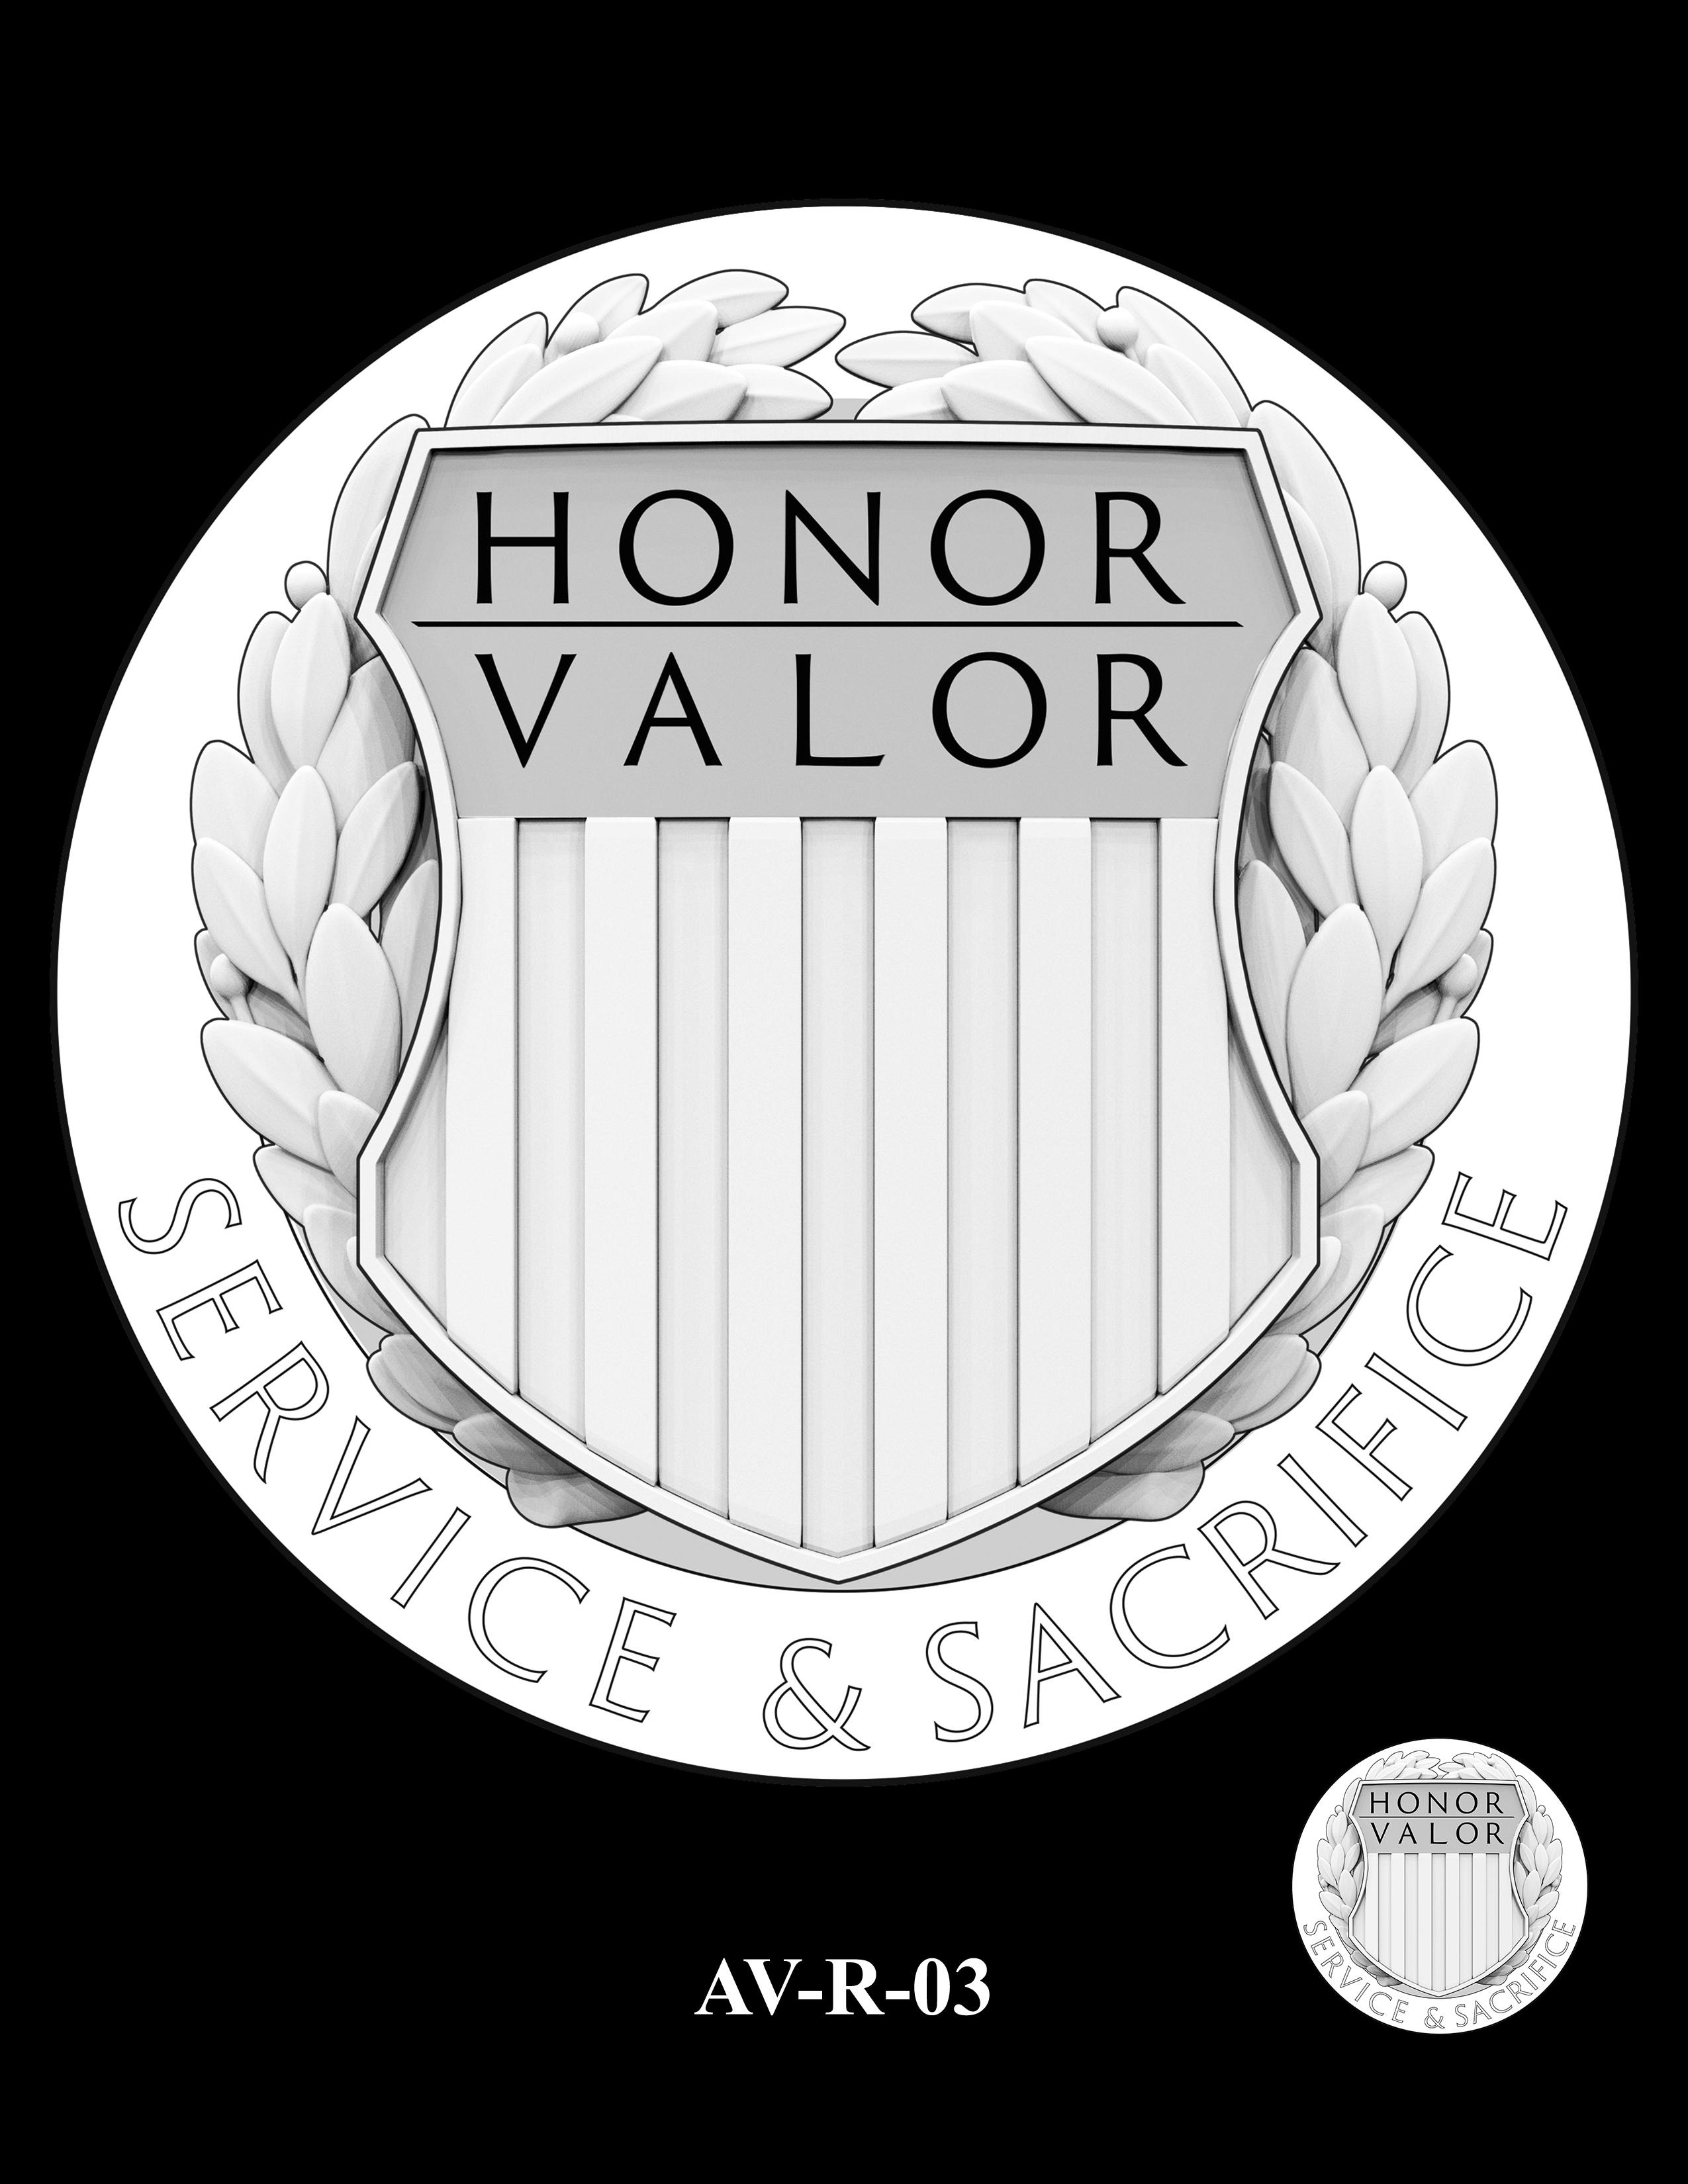 AV-R-03 - American Veterans Medal